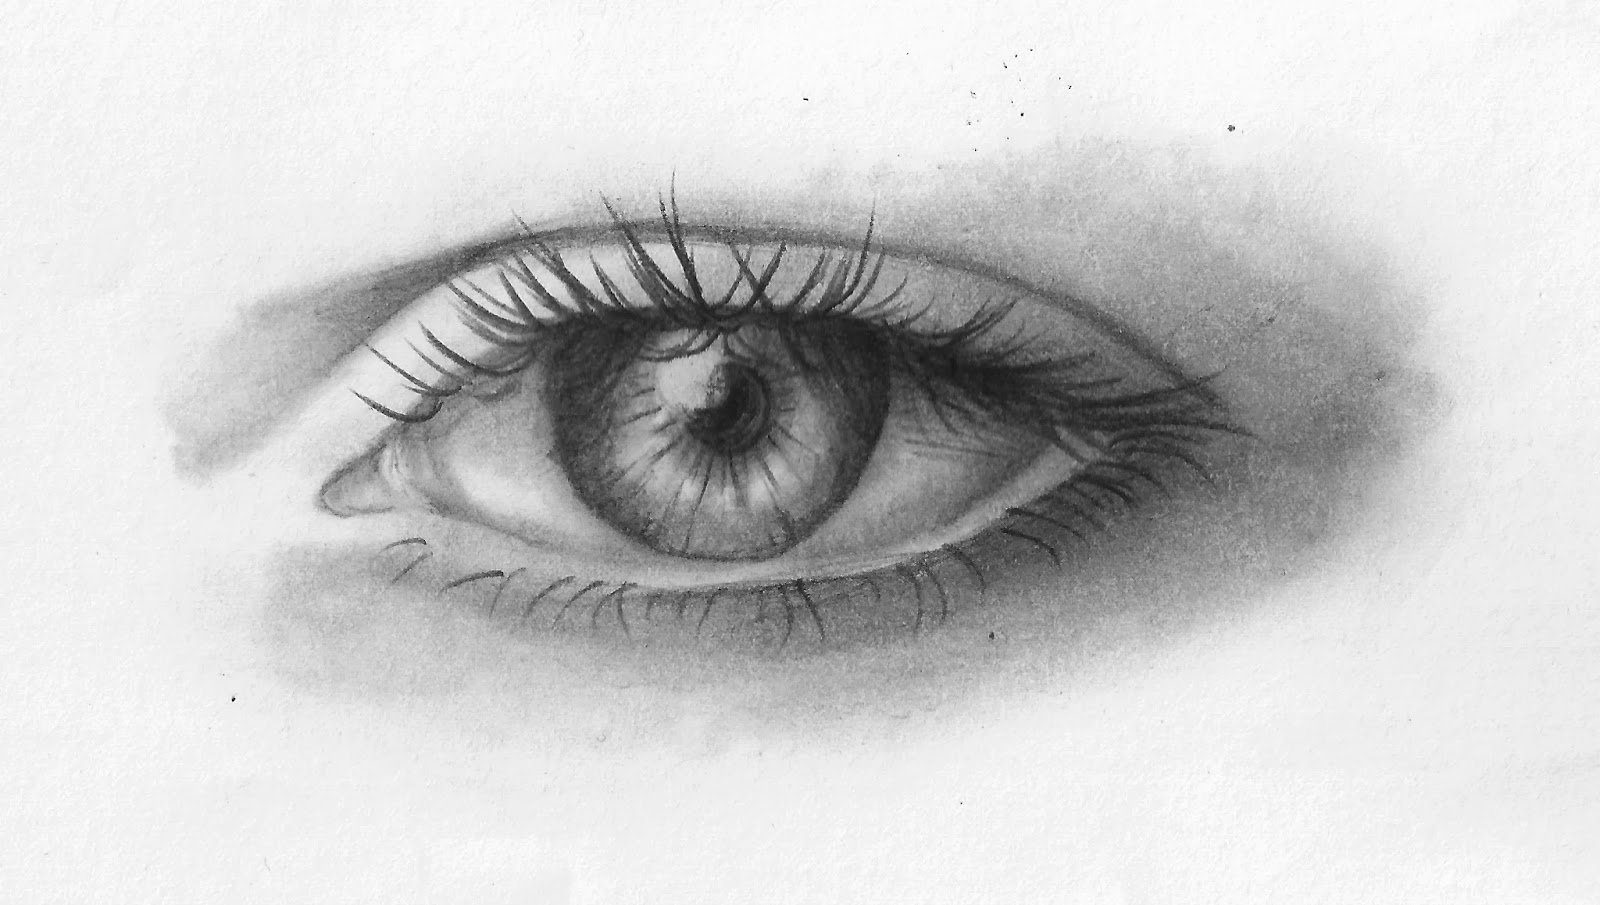 Occhi Disegnati A Matita Realistici Vk44 Regardsdefemmes